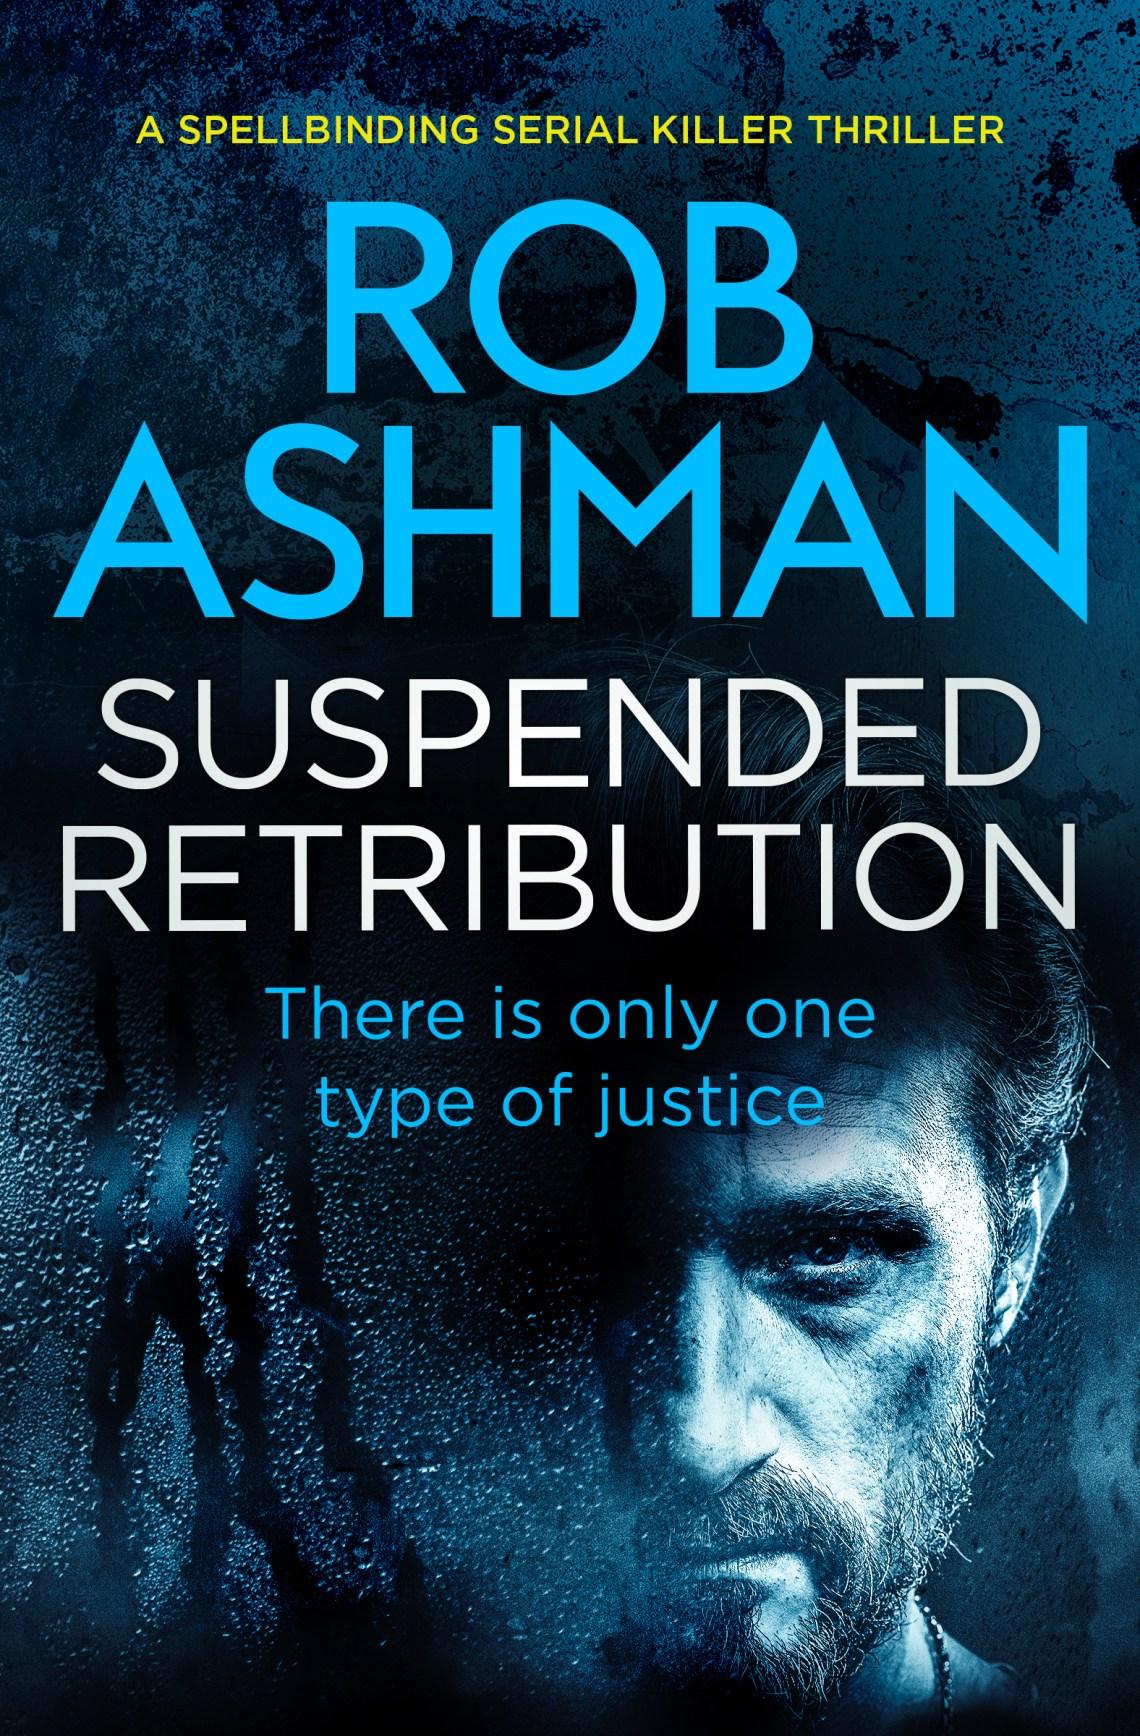 Suspended Retribution - Rob Ashman - Book Cover